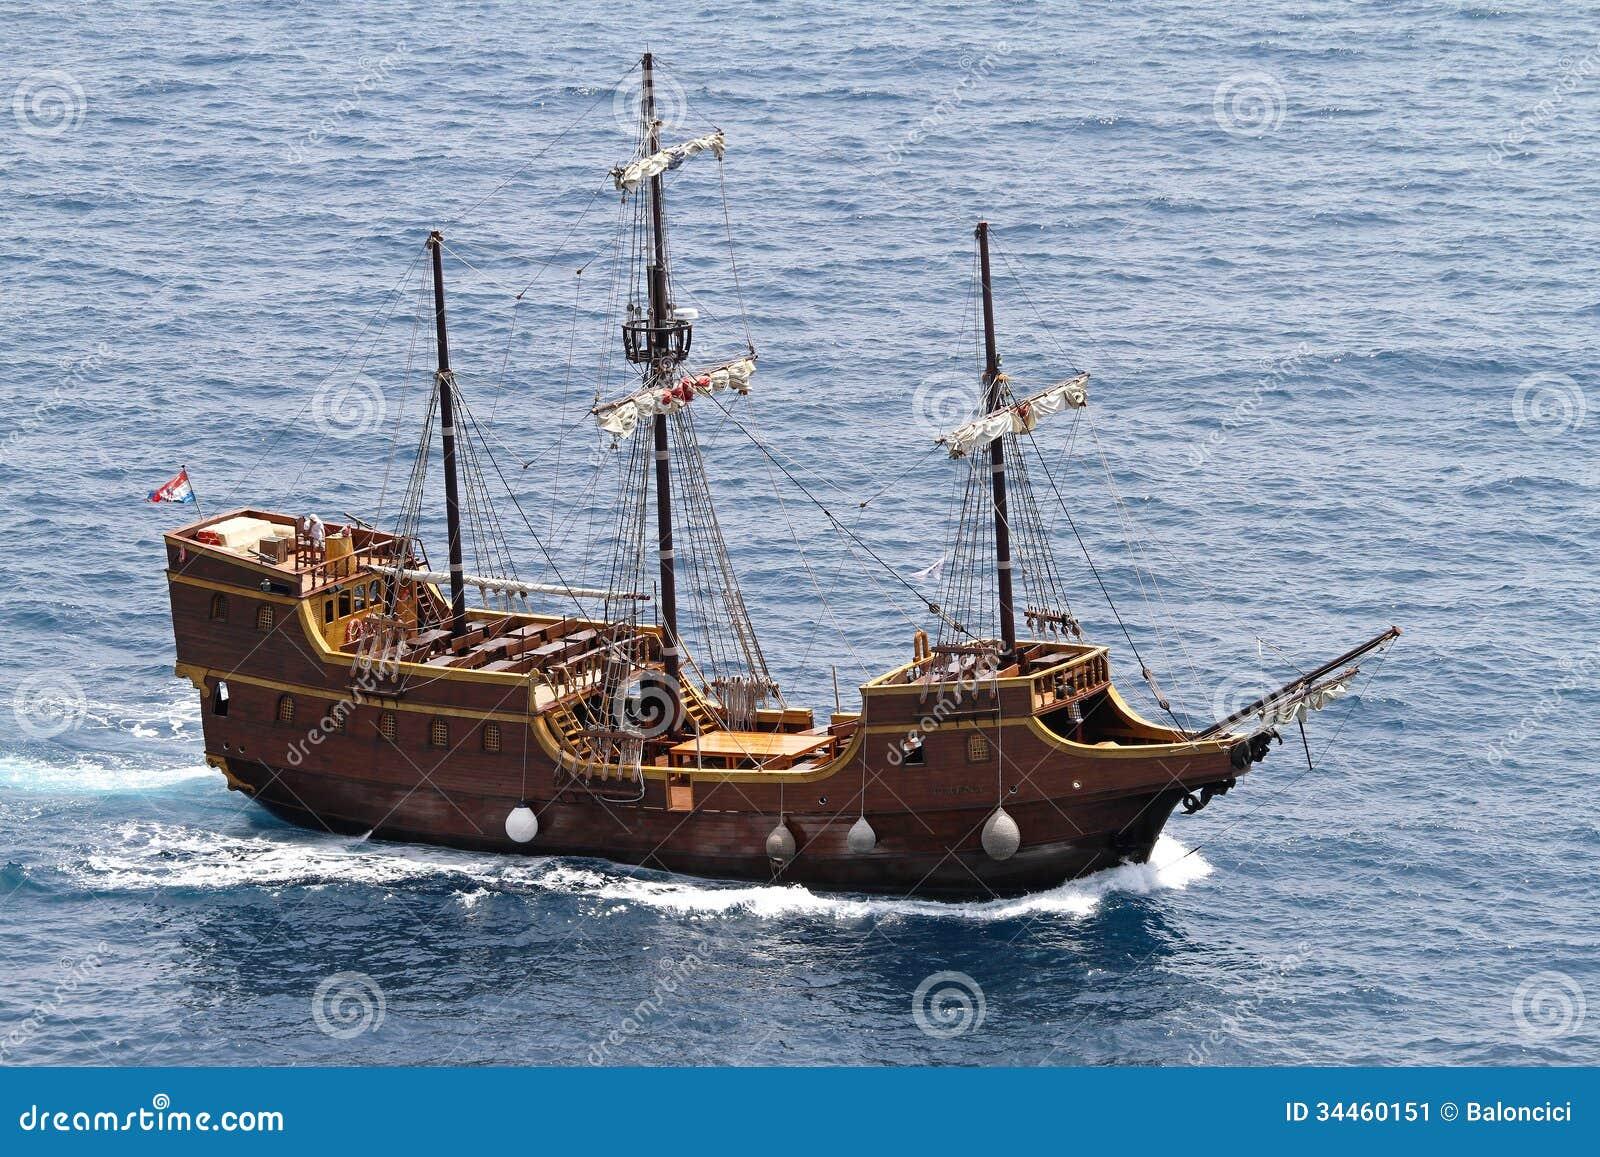 Pirate Ship Editorial Photo - Image: 34460151